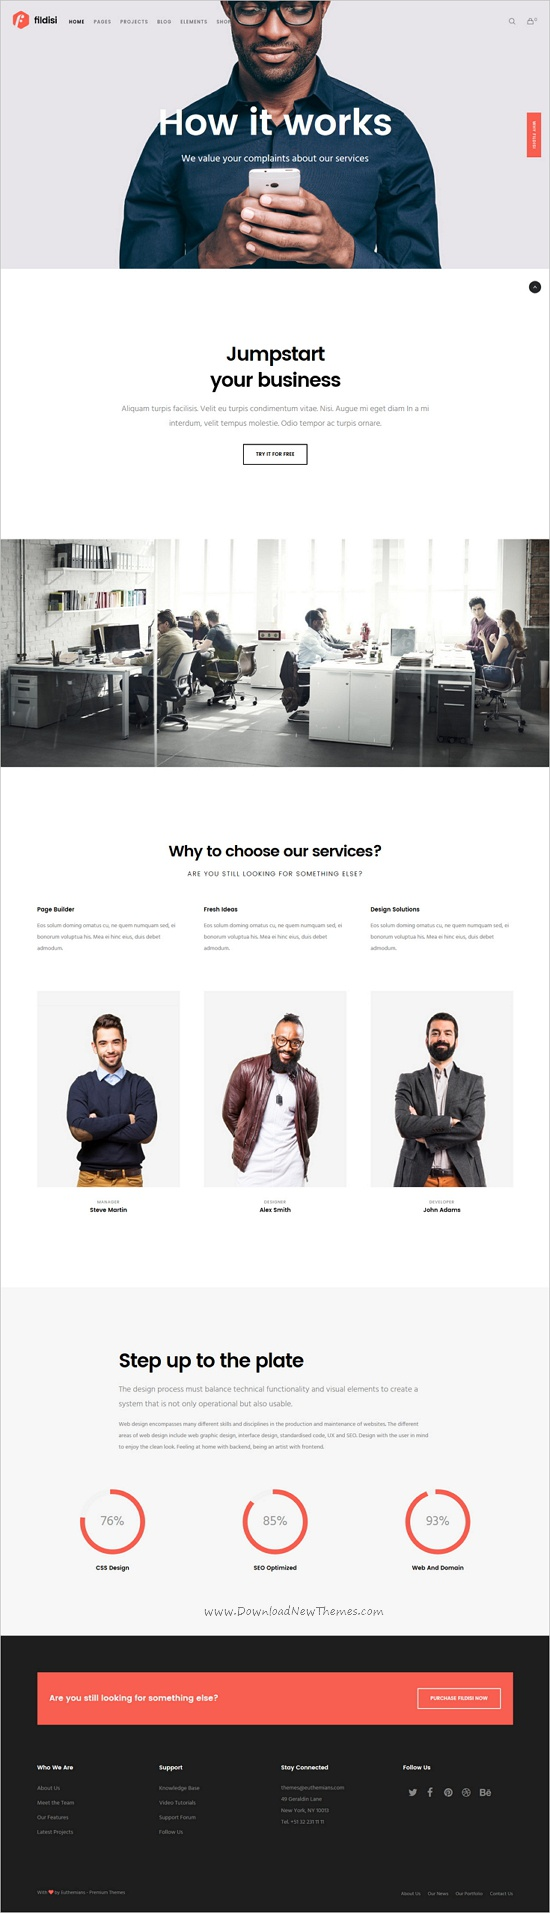 Fildisi is beautifully designn multipurpose responsive 12in1 #WordPress theme for #webdesign like: #corporate, freelancers, #agencies, photographers, designers, bloggers download now➩ https://themeforest.net/item/fildisi-responsive-multipurpose-wordpress-theme/19196010?ref=Datasata